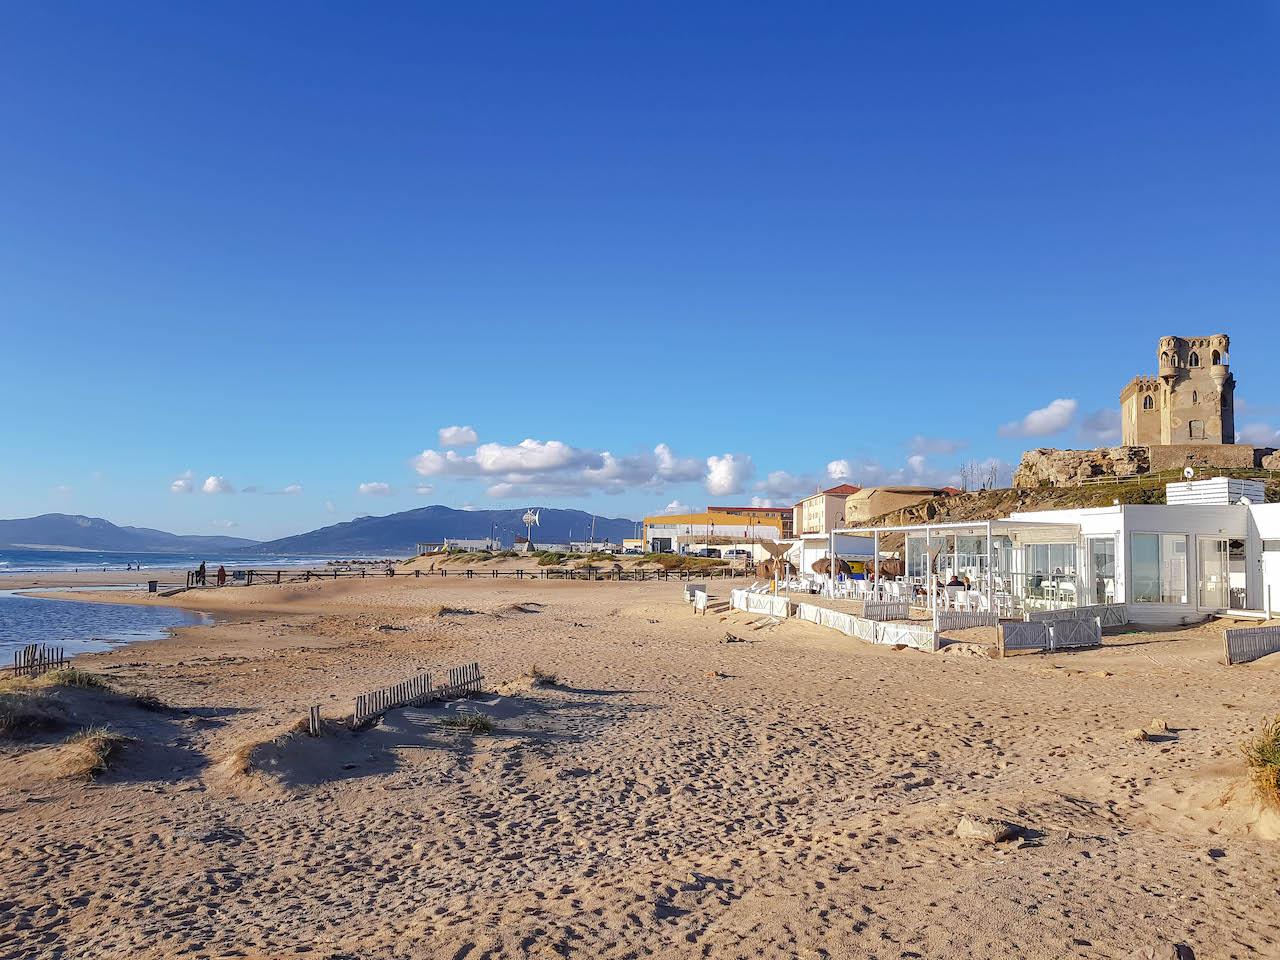 Strandbar an der Playa de los Lances.